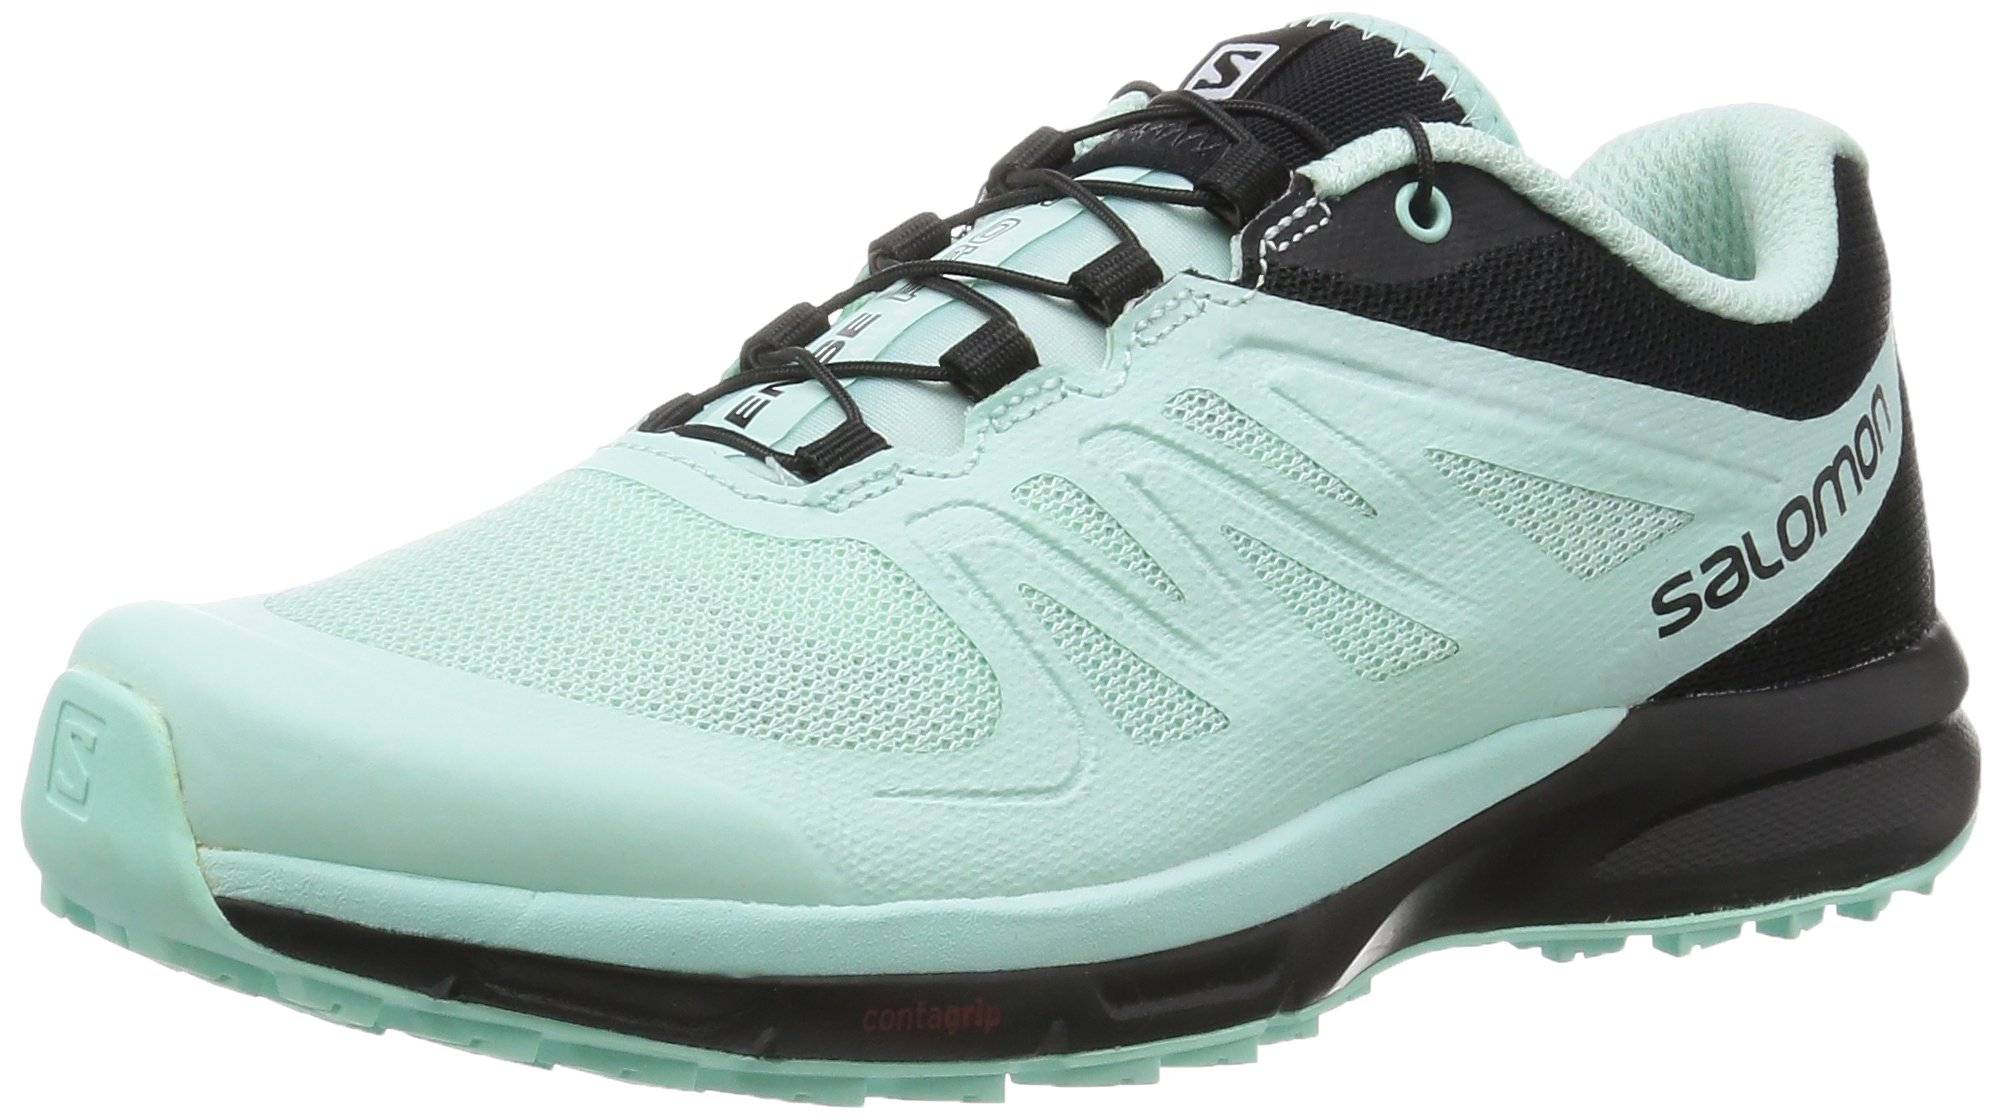 Salomon Sense Pro 2 Trail Running Shoe - Women's Igloo Blue/Igloo Blue/Black 7